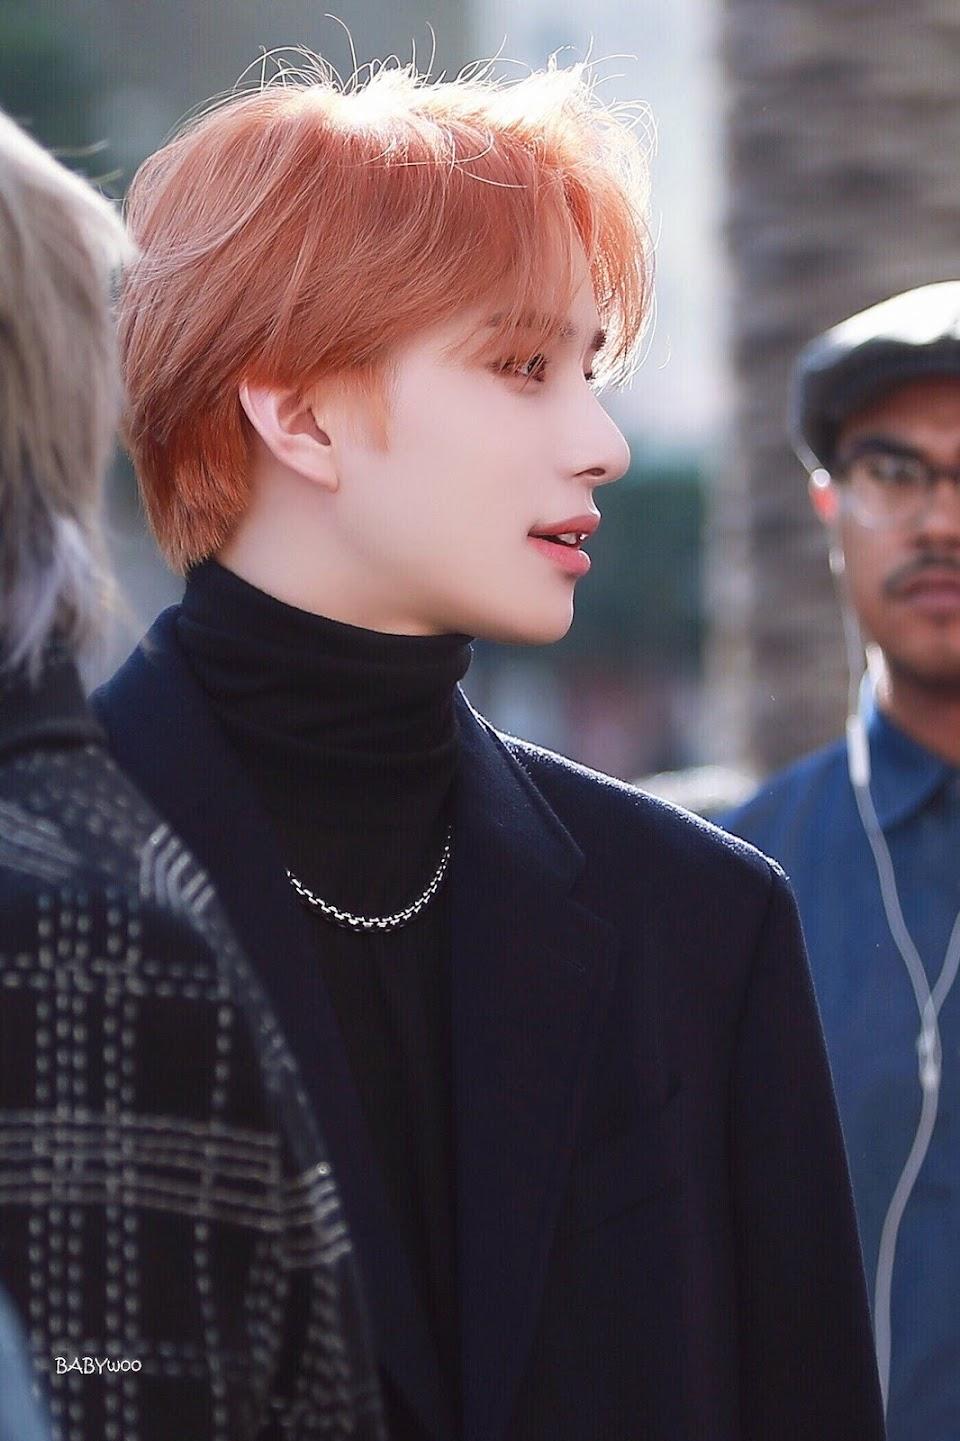 jungwoo profile 5